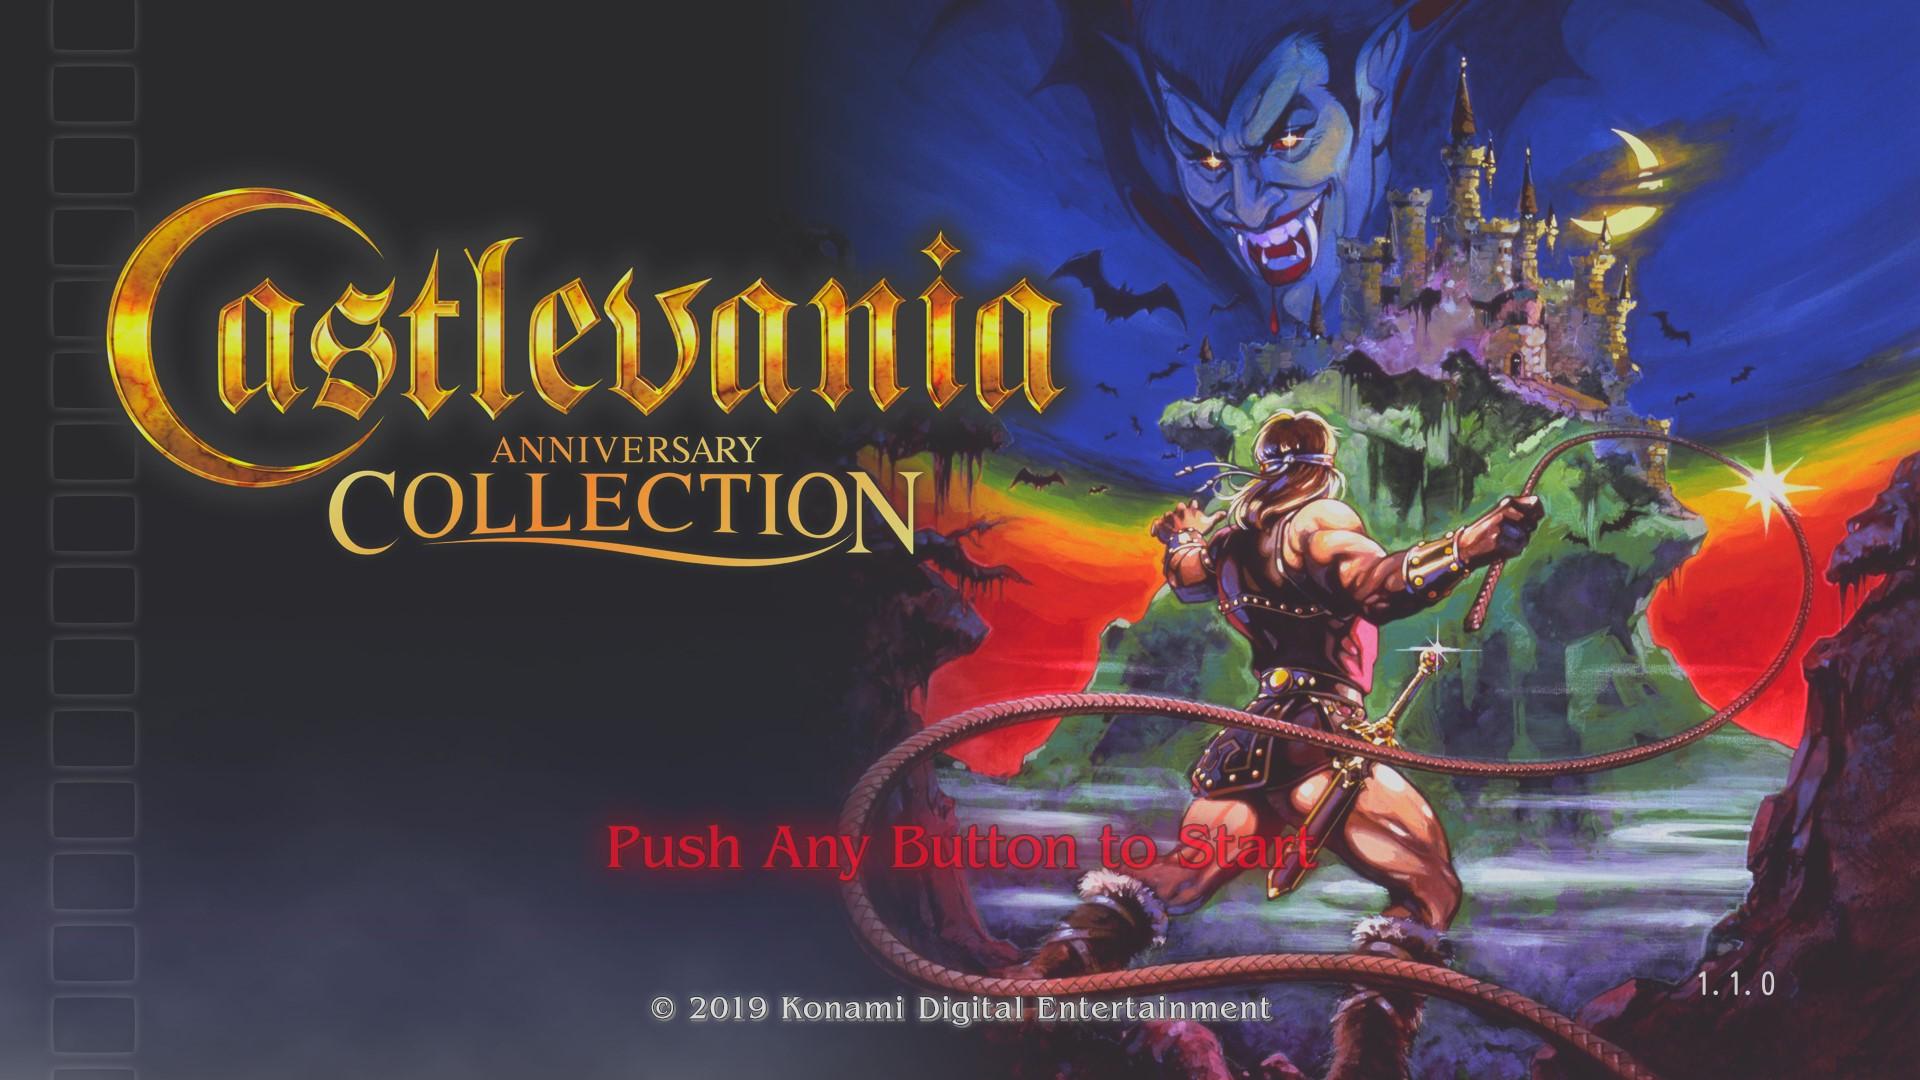 AkinNahtanoj: Castlevania (PC) 61,370 points on 2020-08-21 15:50:29